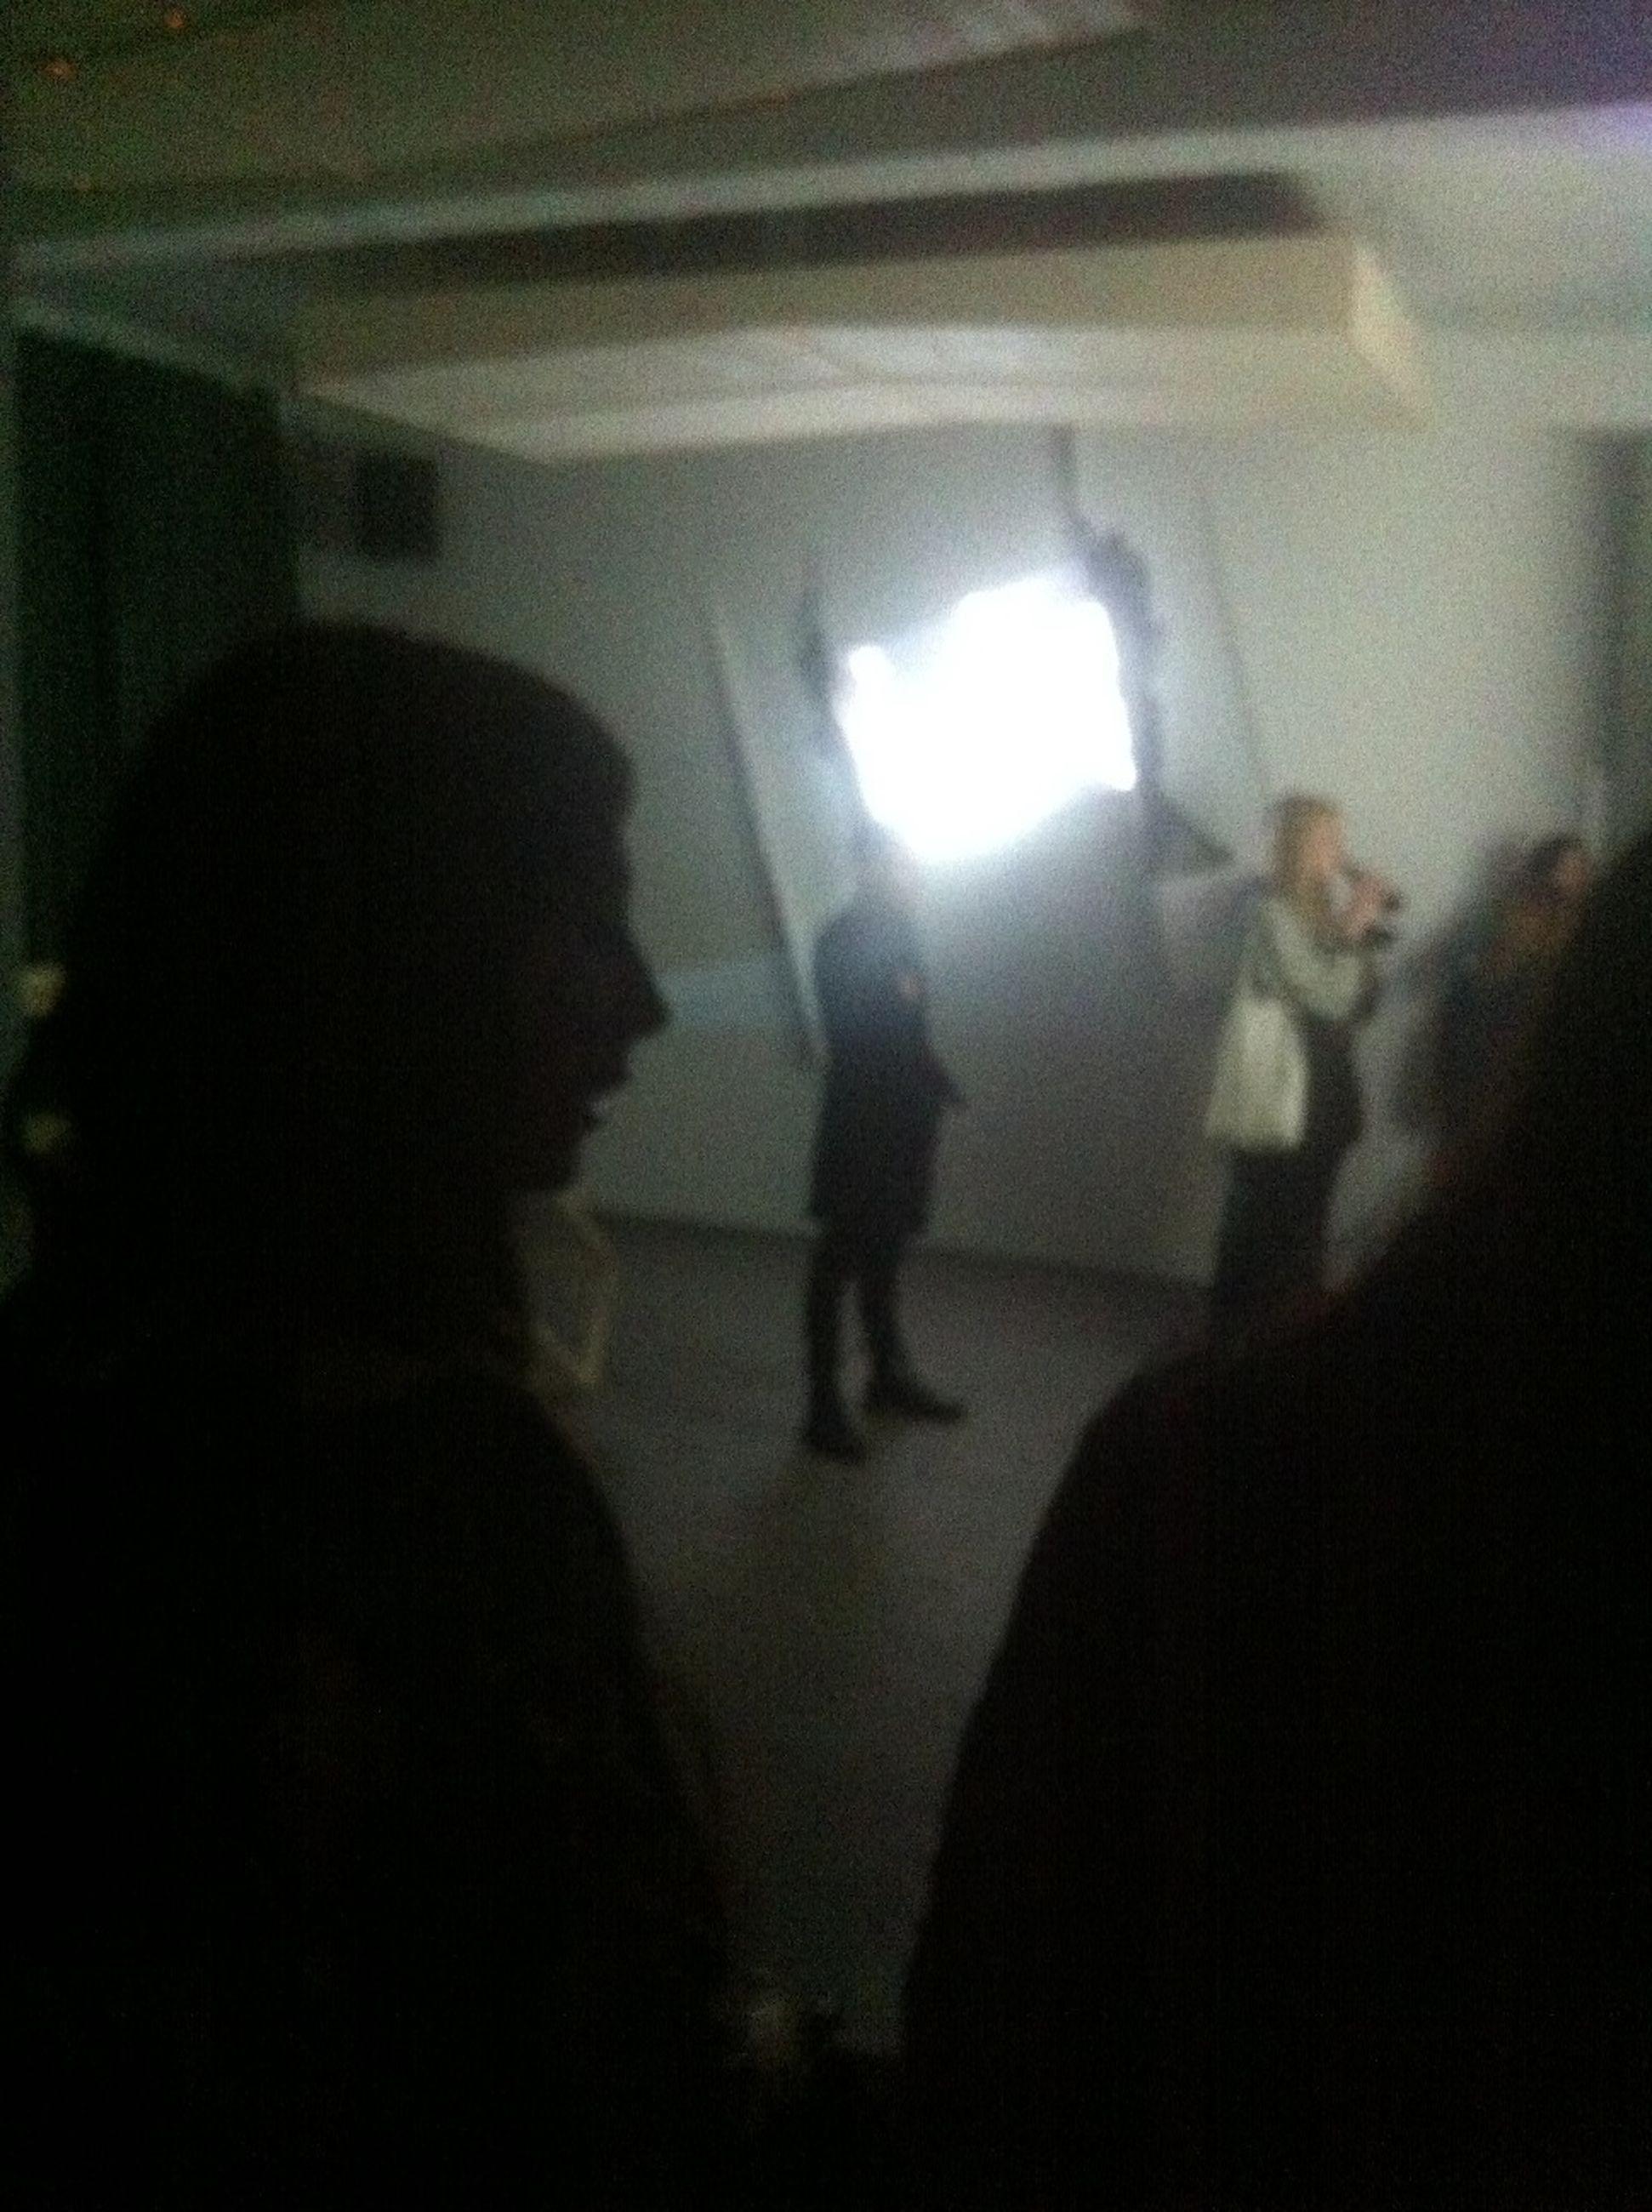 indoors, silhouette, lifestyles, men, leisure activity, illuminated, transportation, person, dark, walking, rear view, night, standing, window, city life, full length, travel, mode of transport